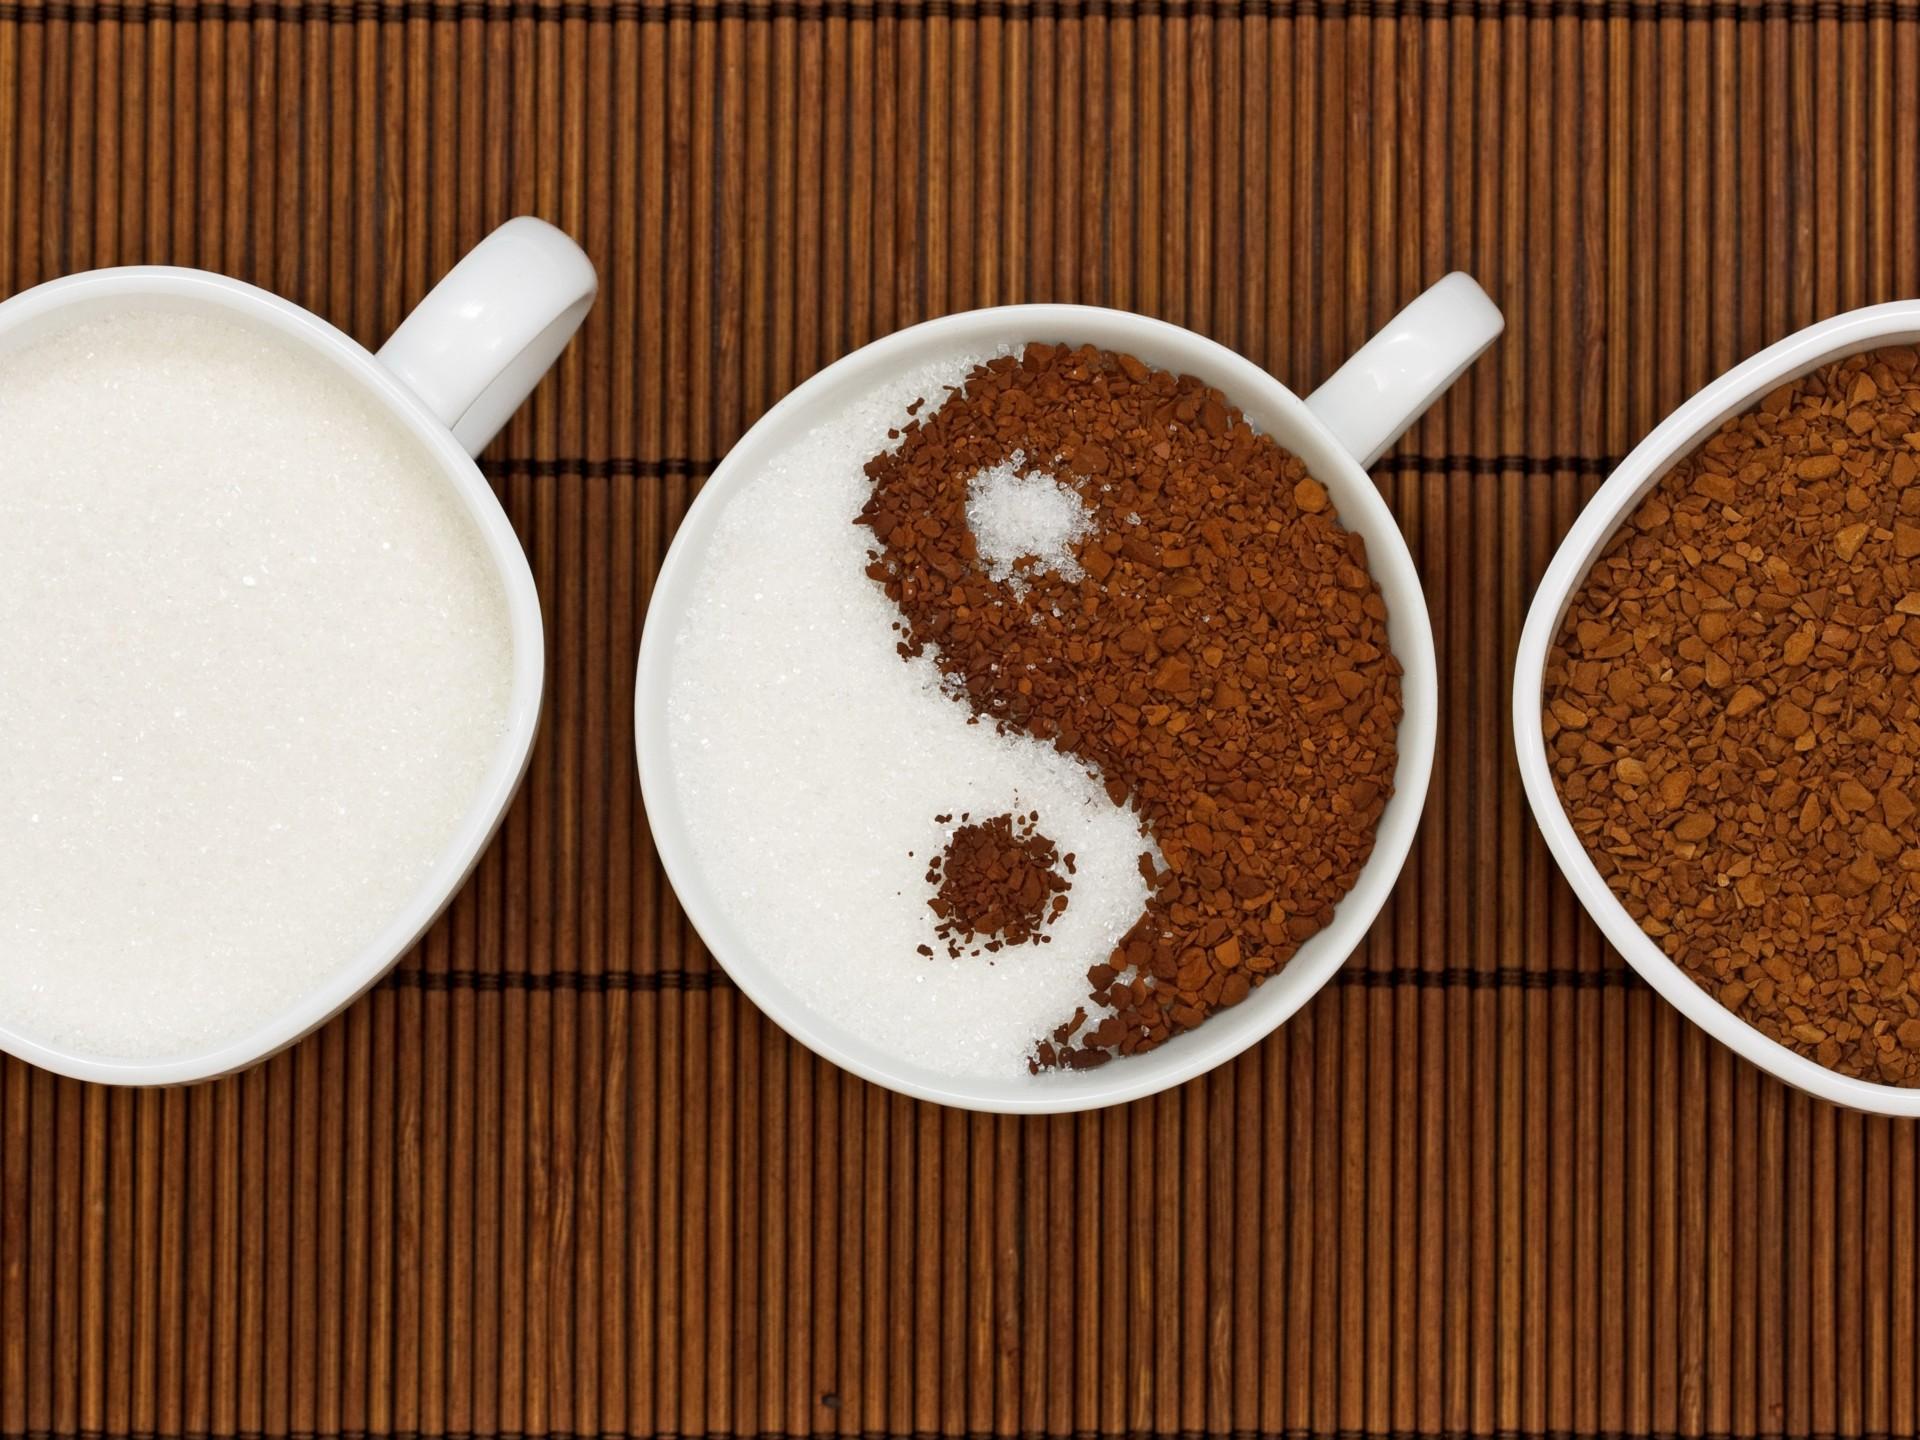 Кофе защитит от рецидива рака молочной железы